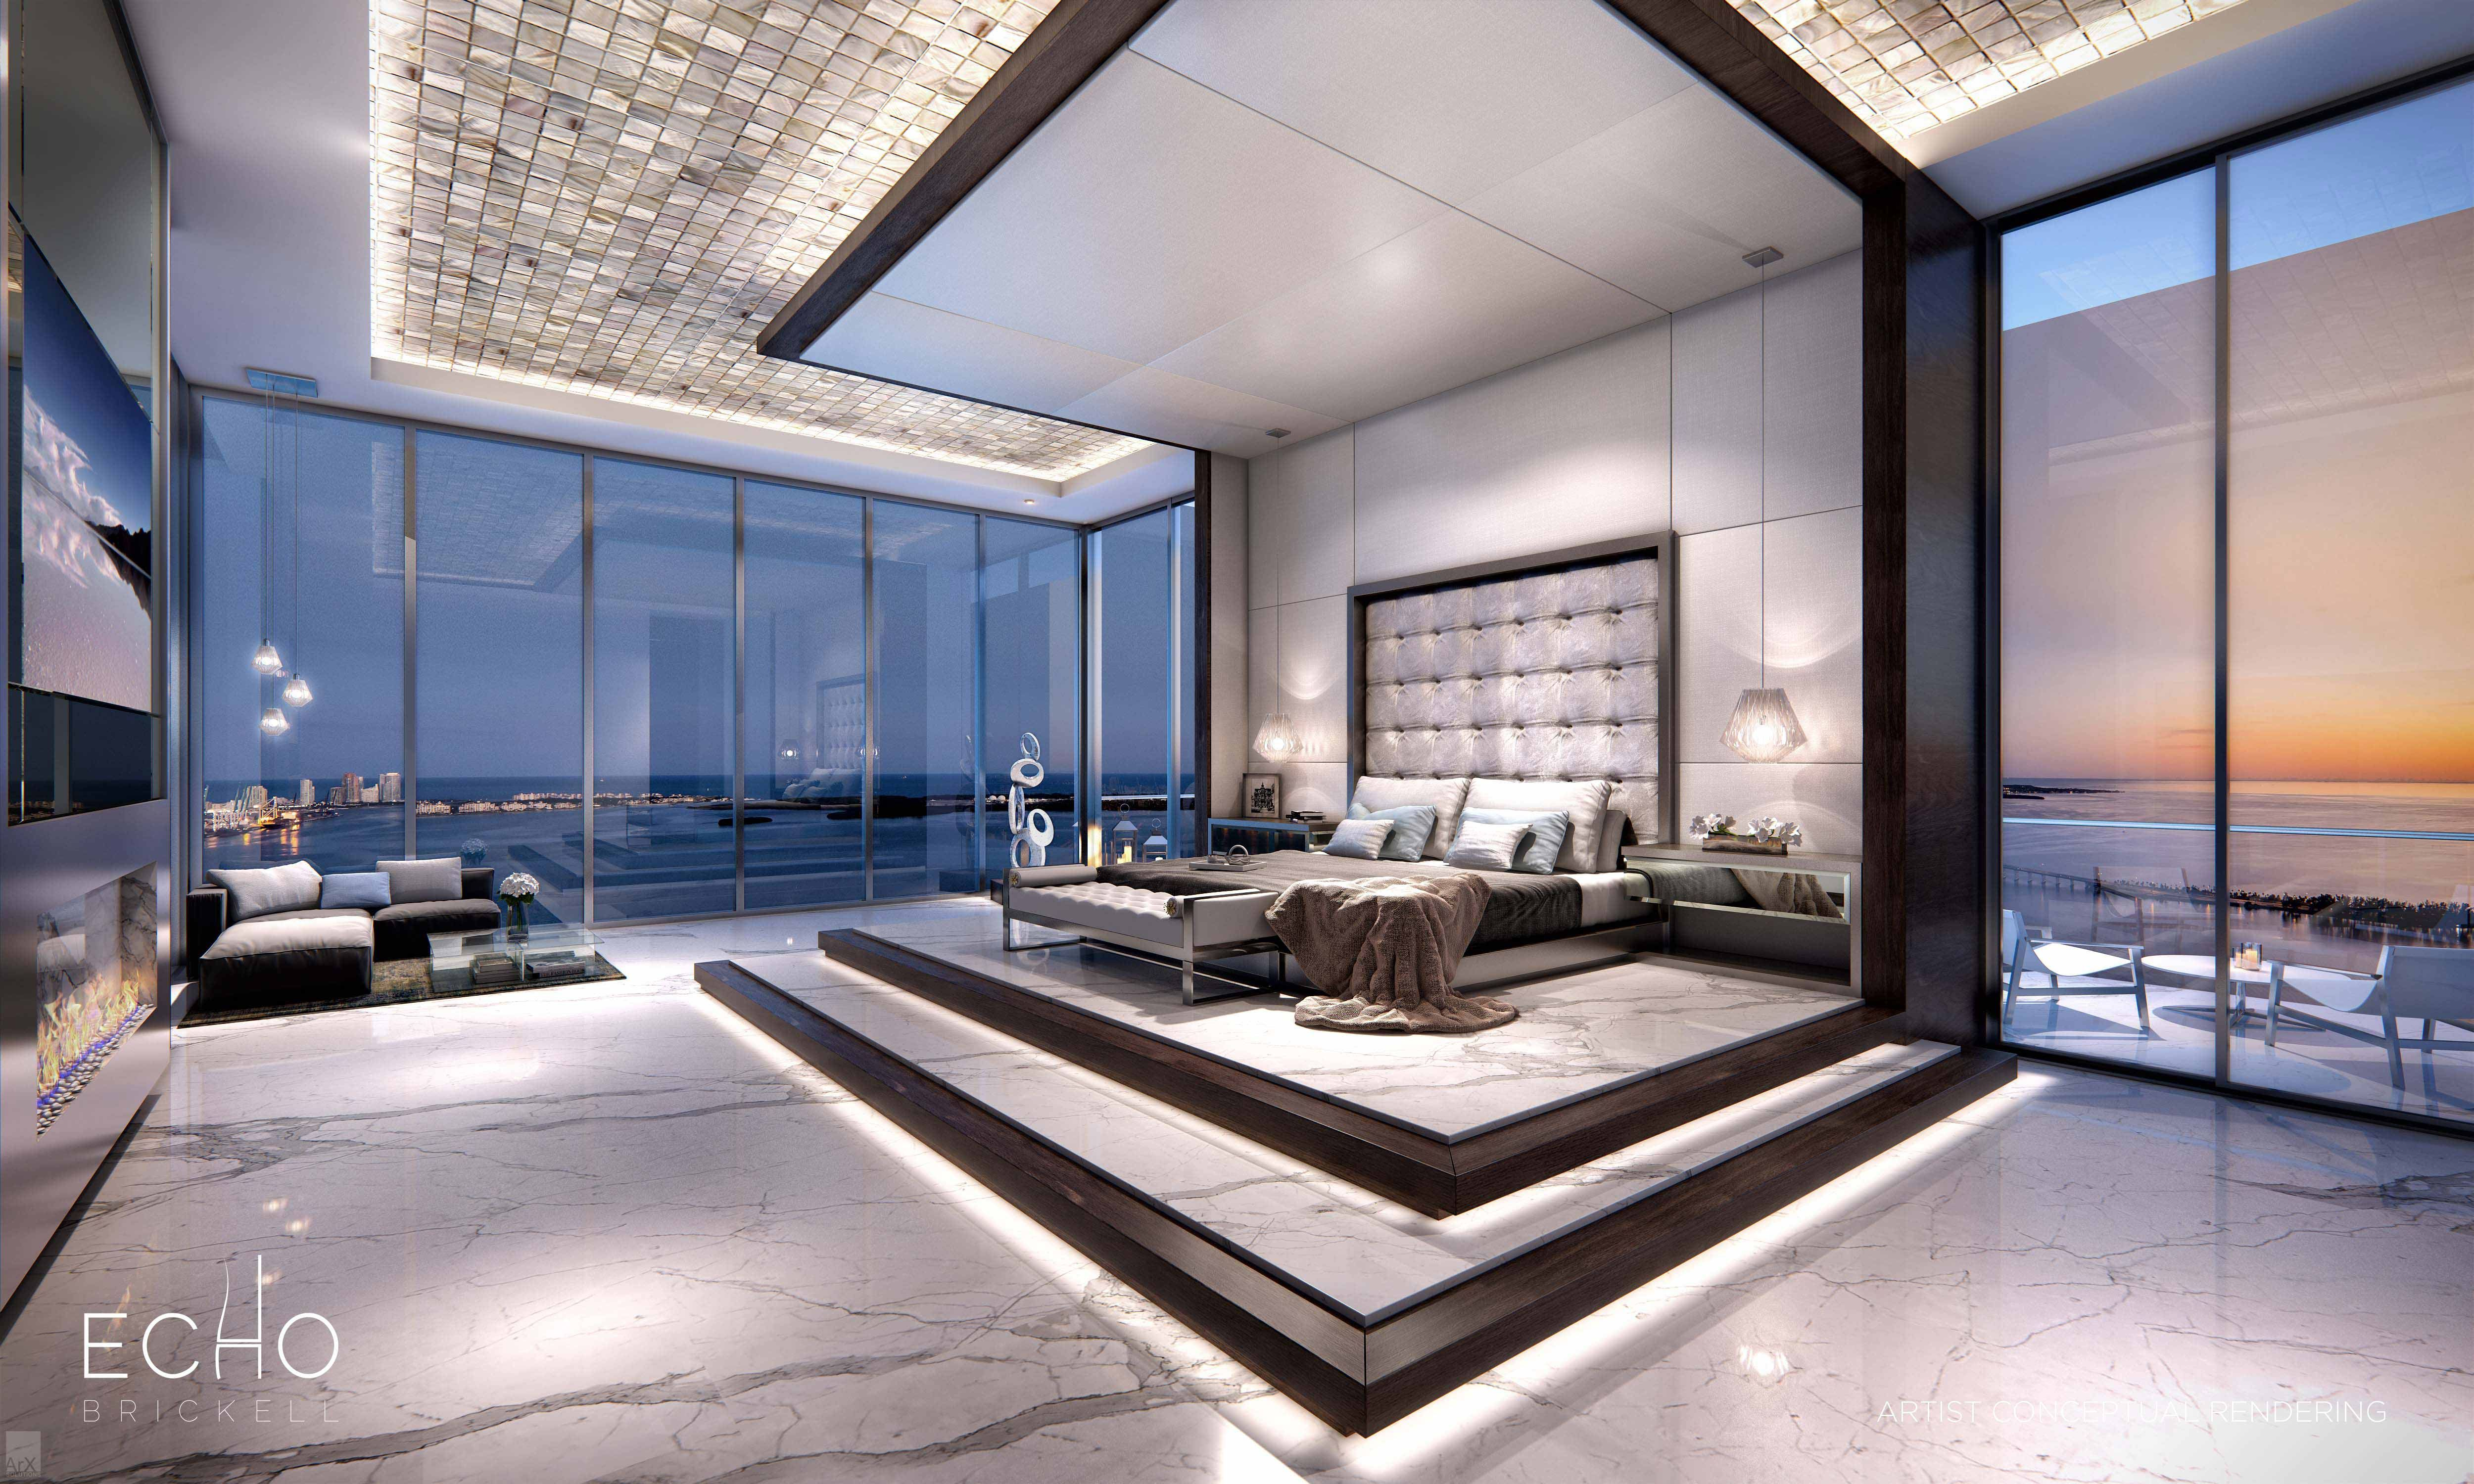 Echo Brickell Carlos Ott Penthouse Master Bedroom Luxury Bedroom